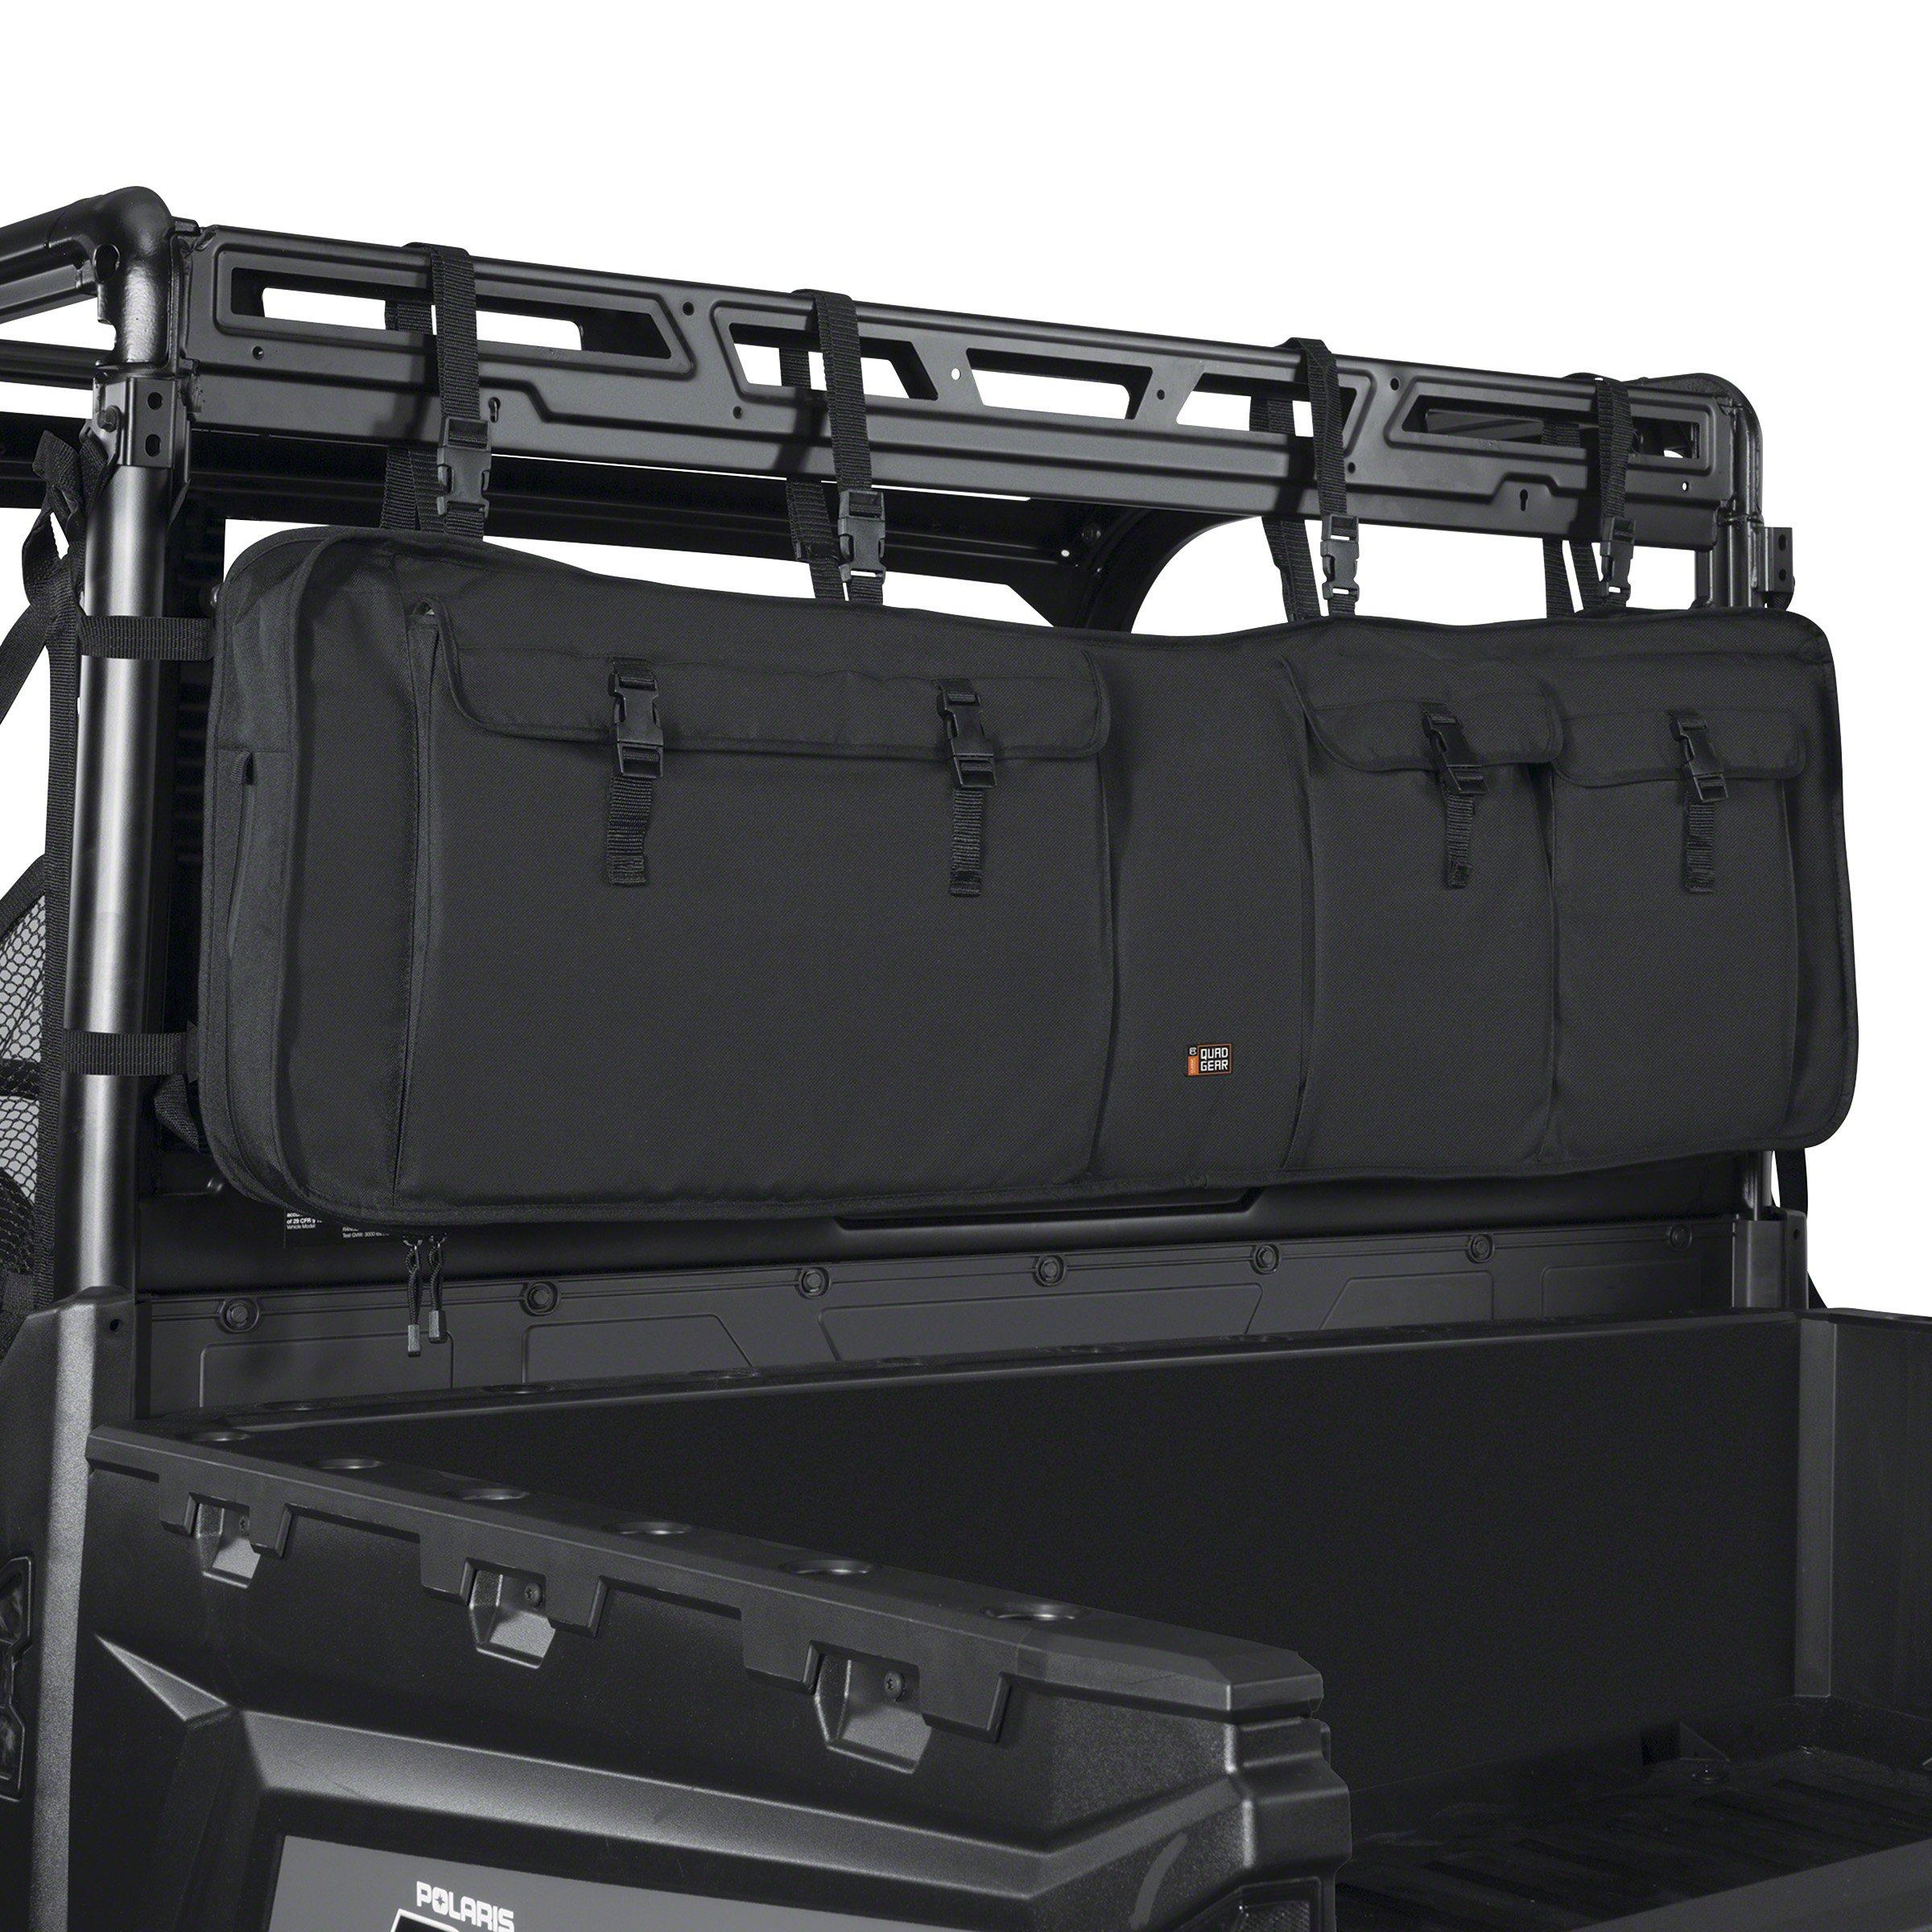 Classic Accessories QuadGear Black UTV Double Gun Carrier - 18-129-010401-00 by Classic Accessories